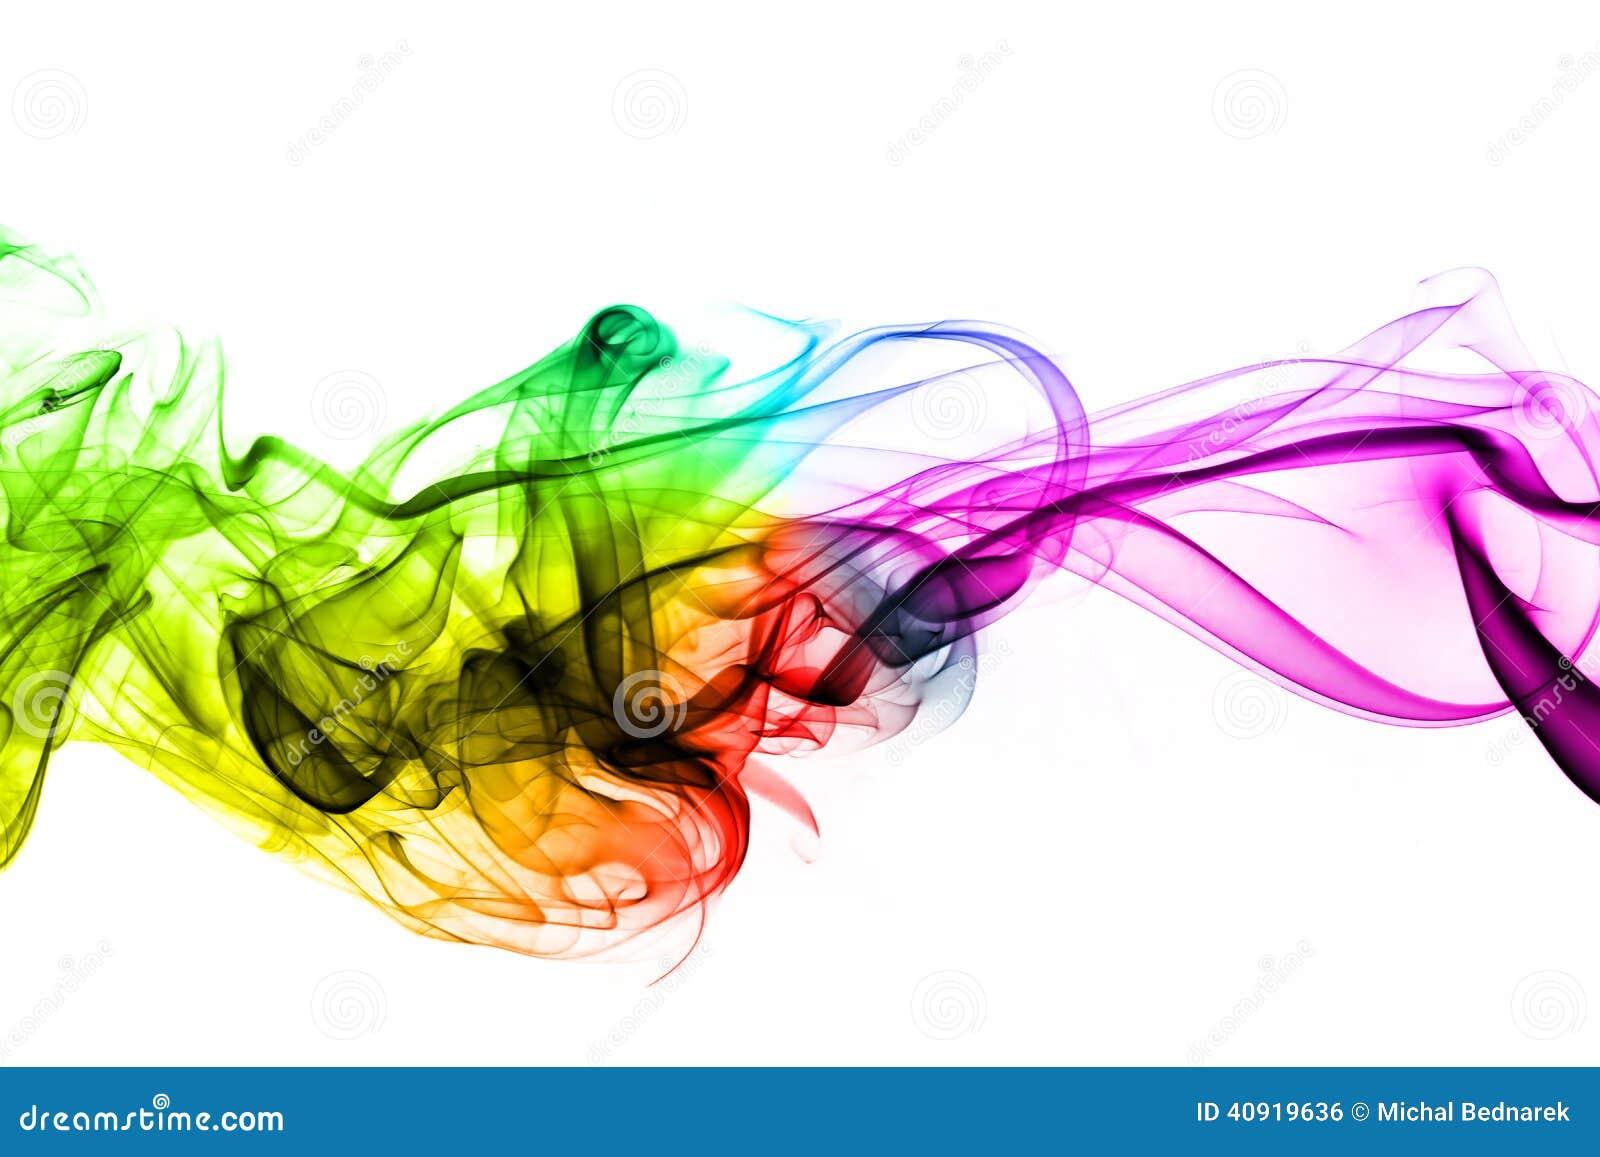 Creative Graphics Design Background: Colorful Creative Smoke Waves Stock Photo